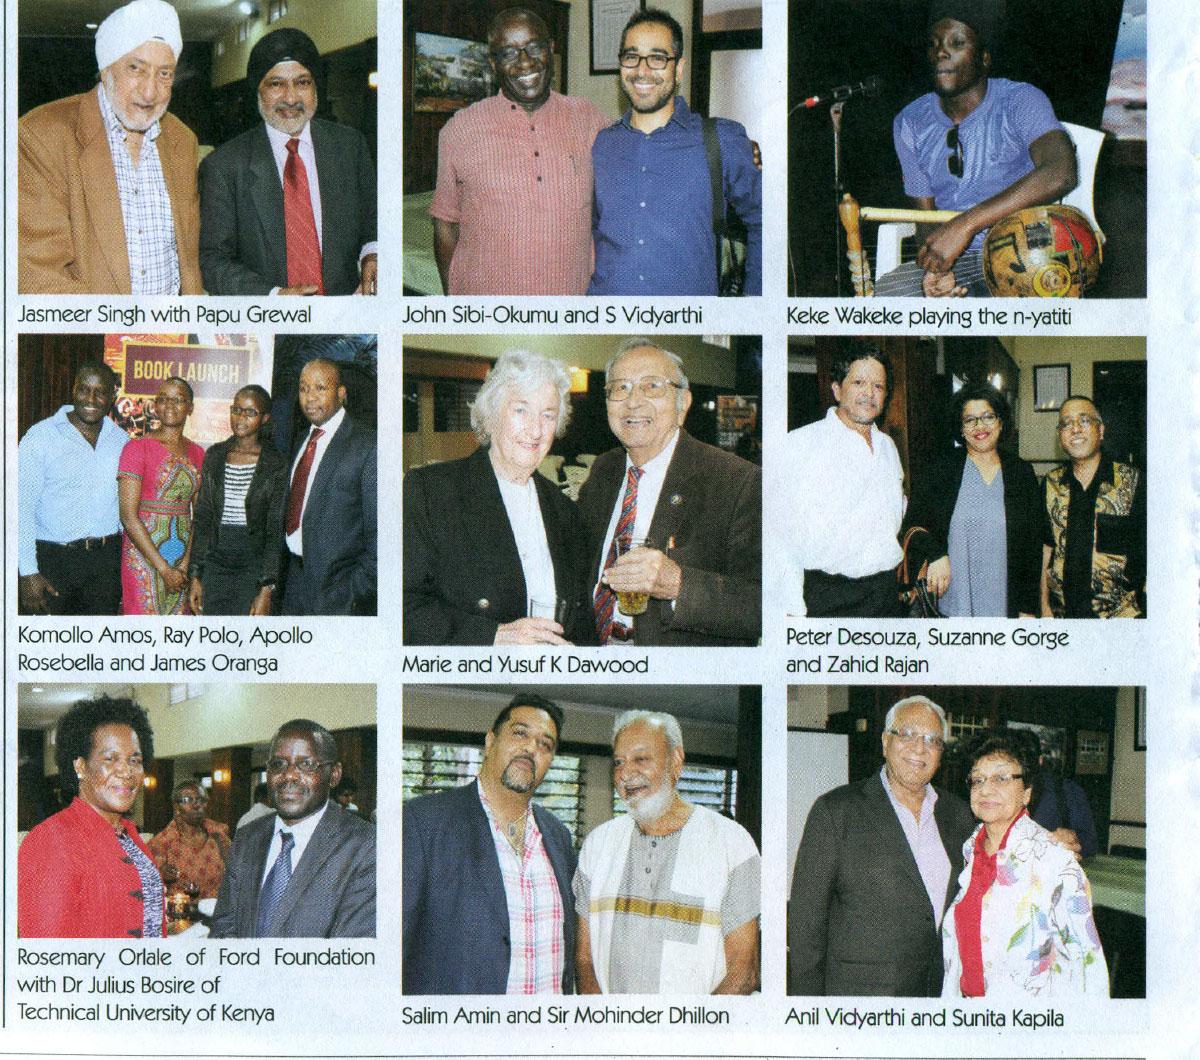 In Between World of Kenya_s Media 1b